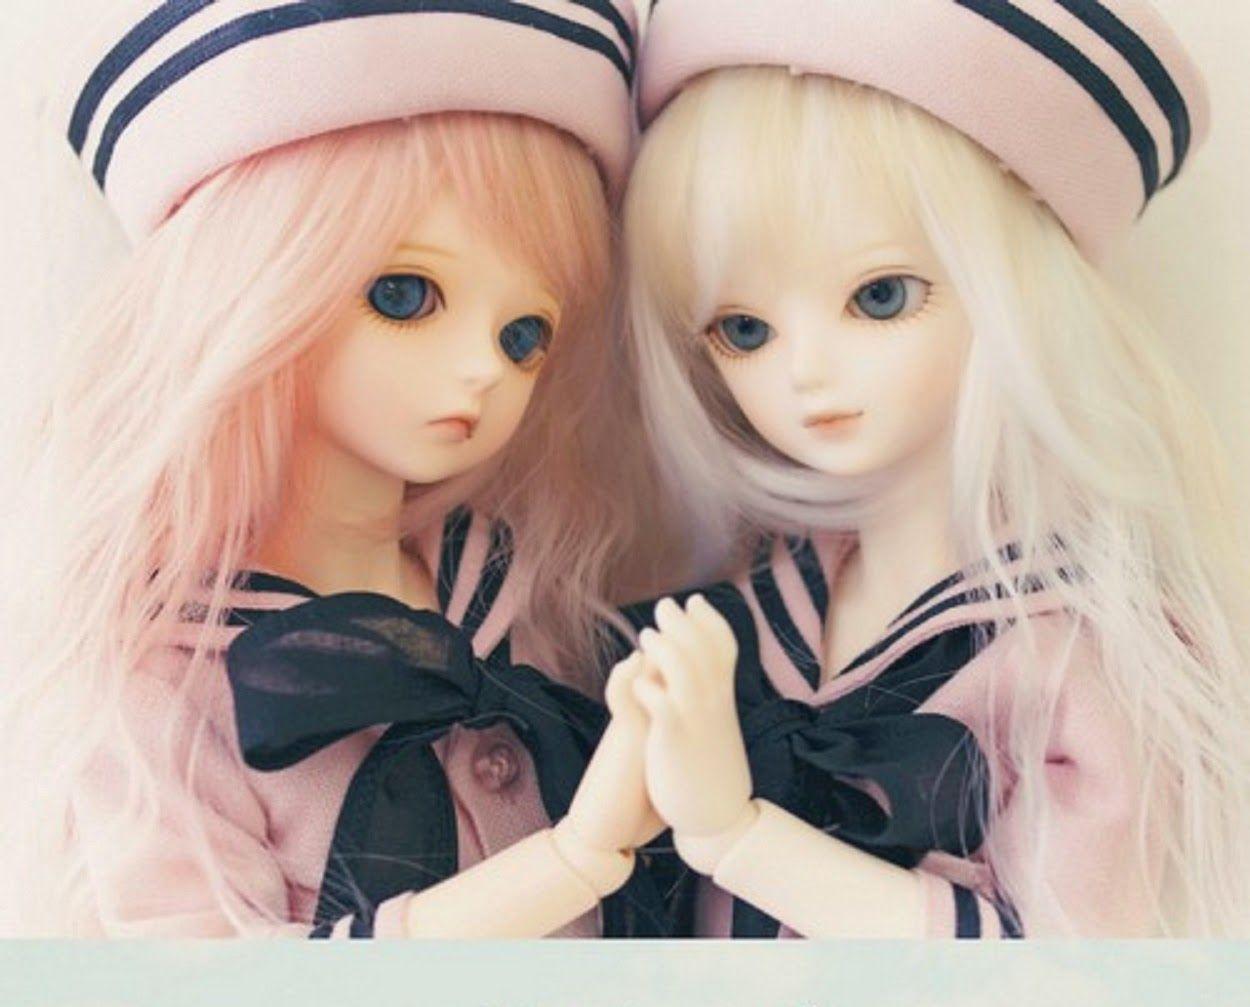 Unique Hd Wallpapers 4u Cute Twins Barbie Dolls Hd